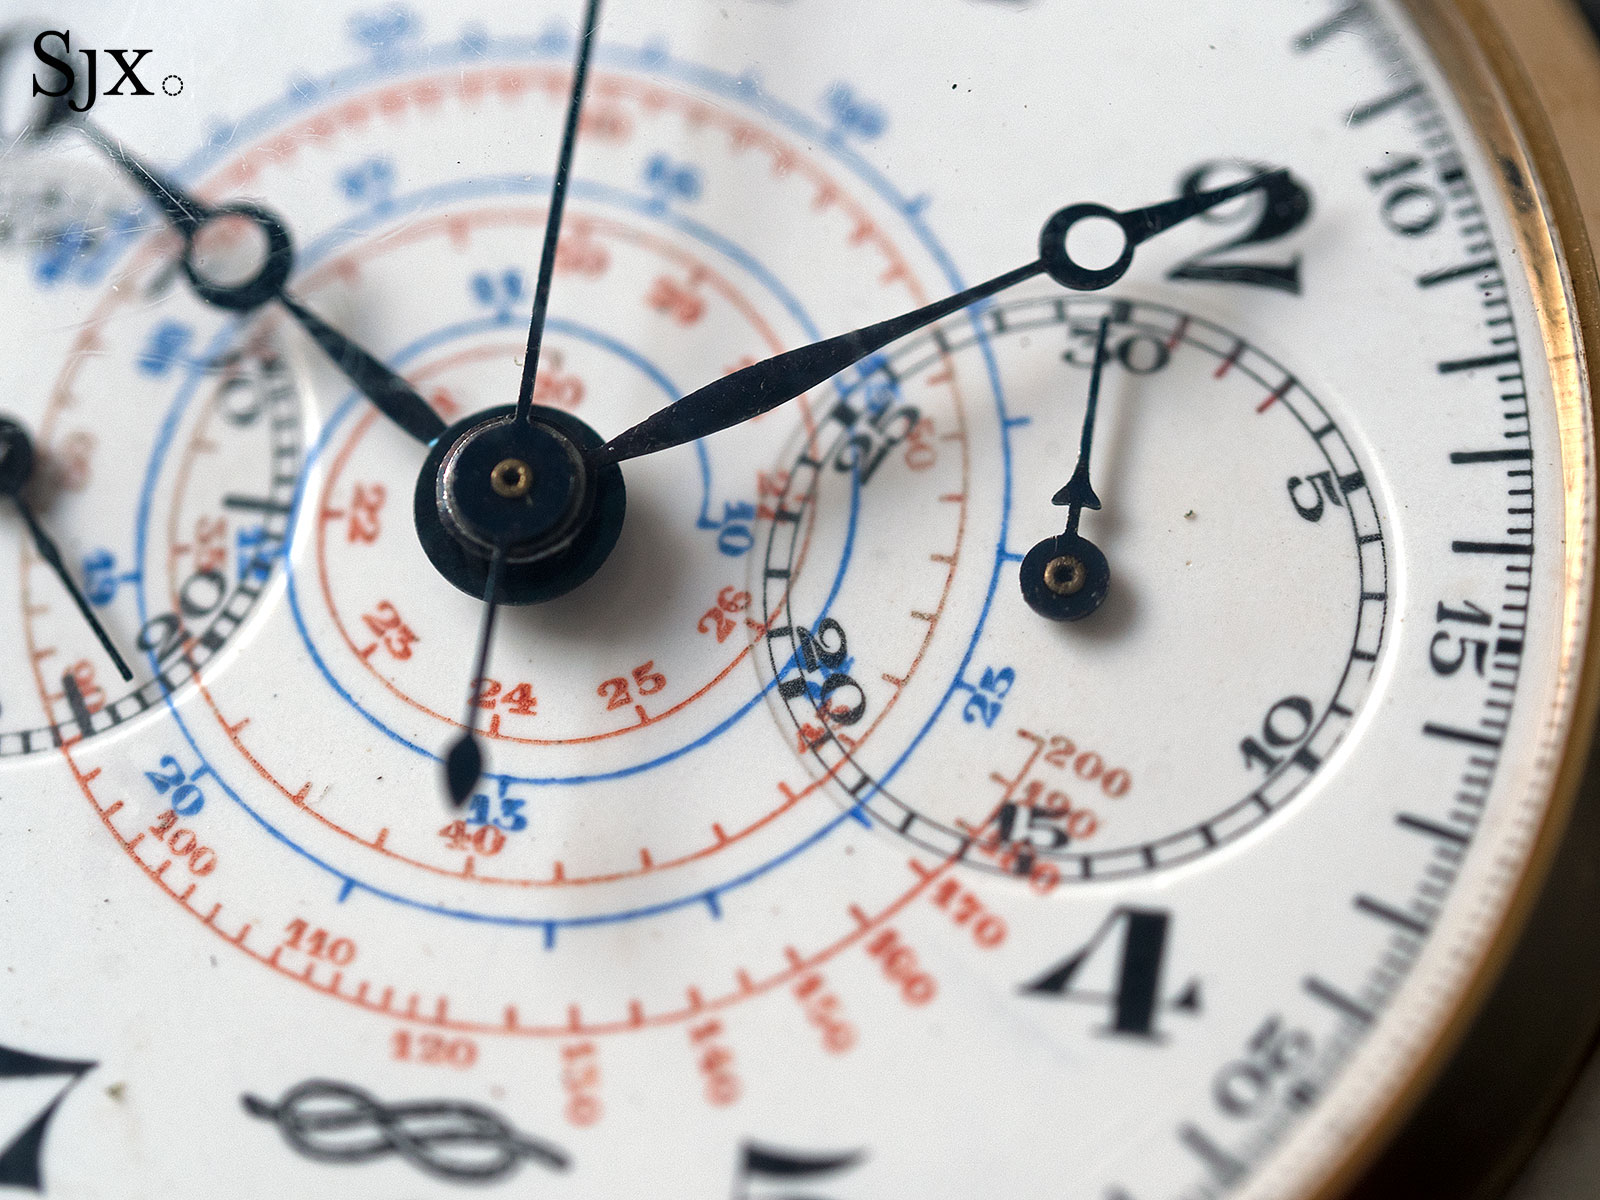 Zenith 4528 Marina Militare chronograph 5